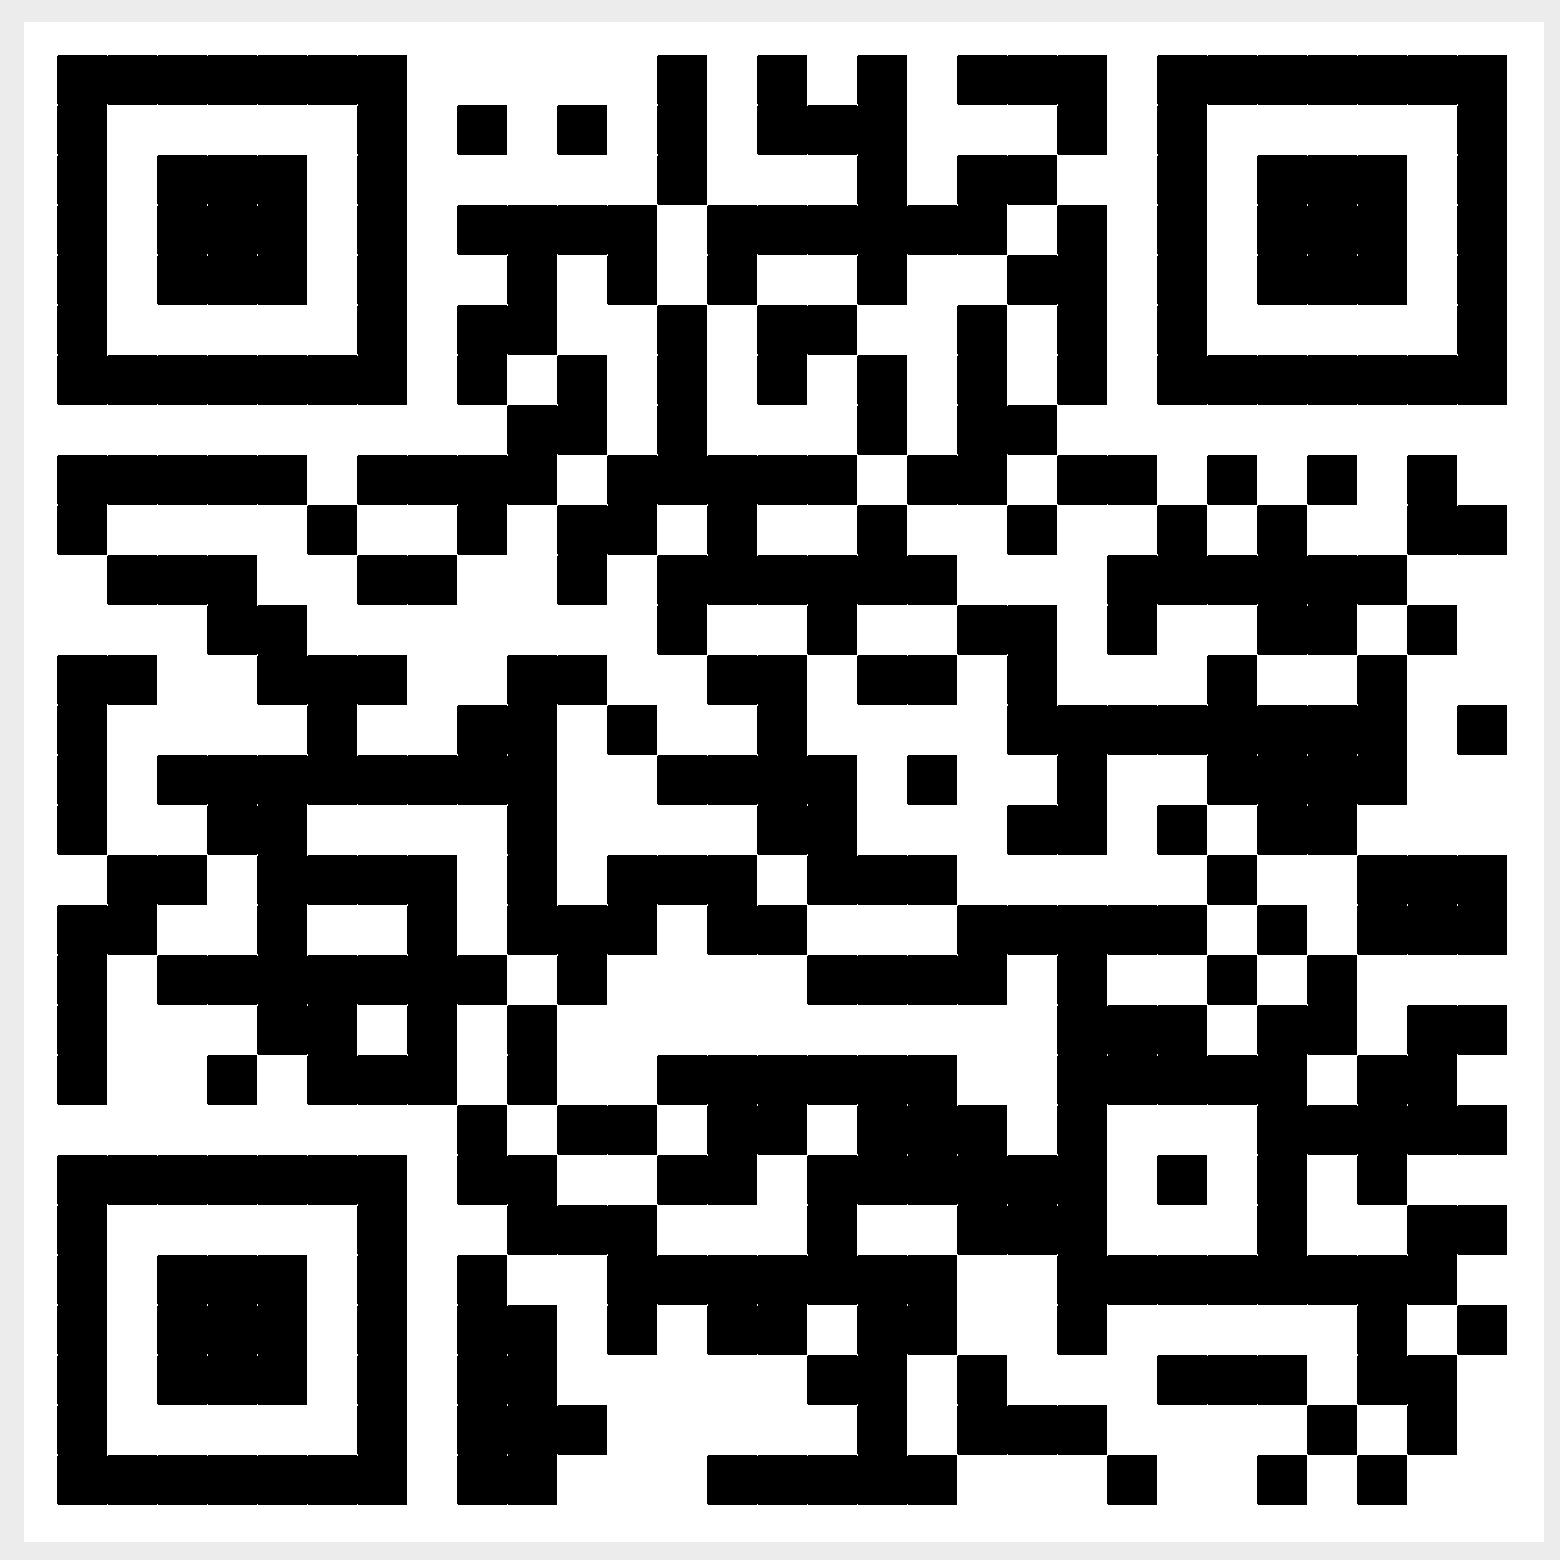 QR code_bitcoin.png